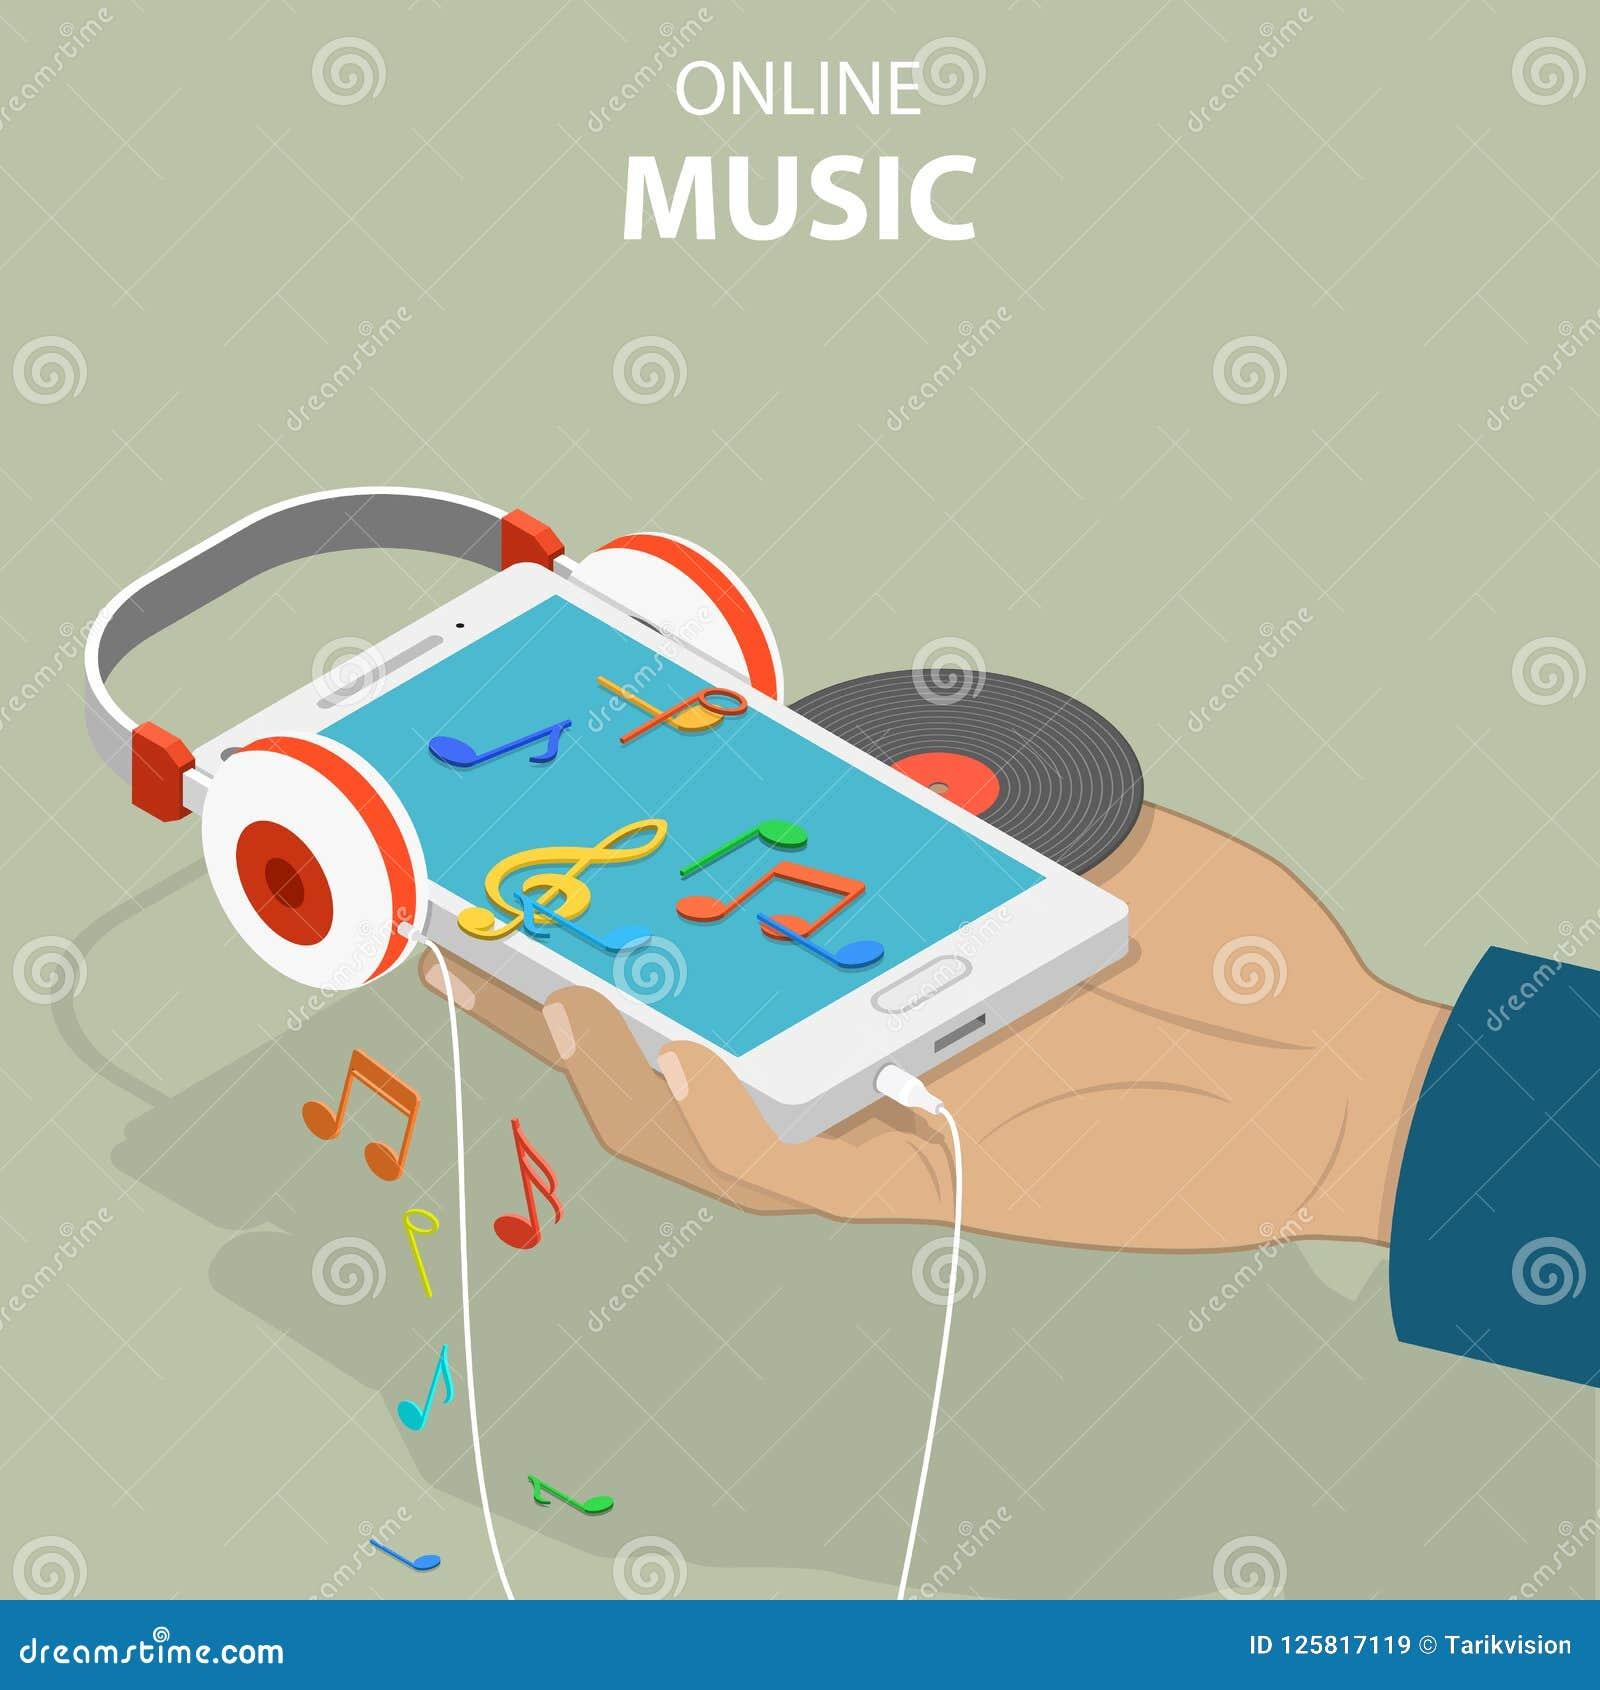 Mobile Music Isometric Flat Vector Conceptual Illustration